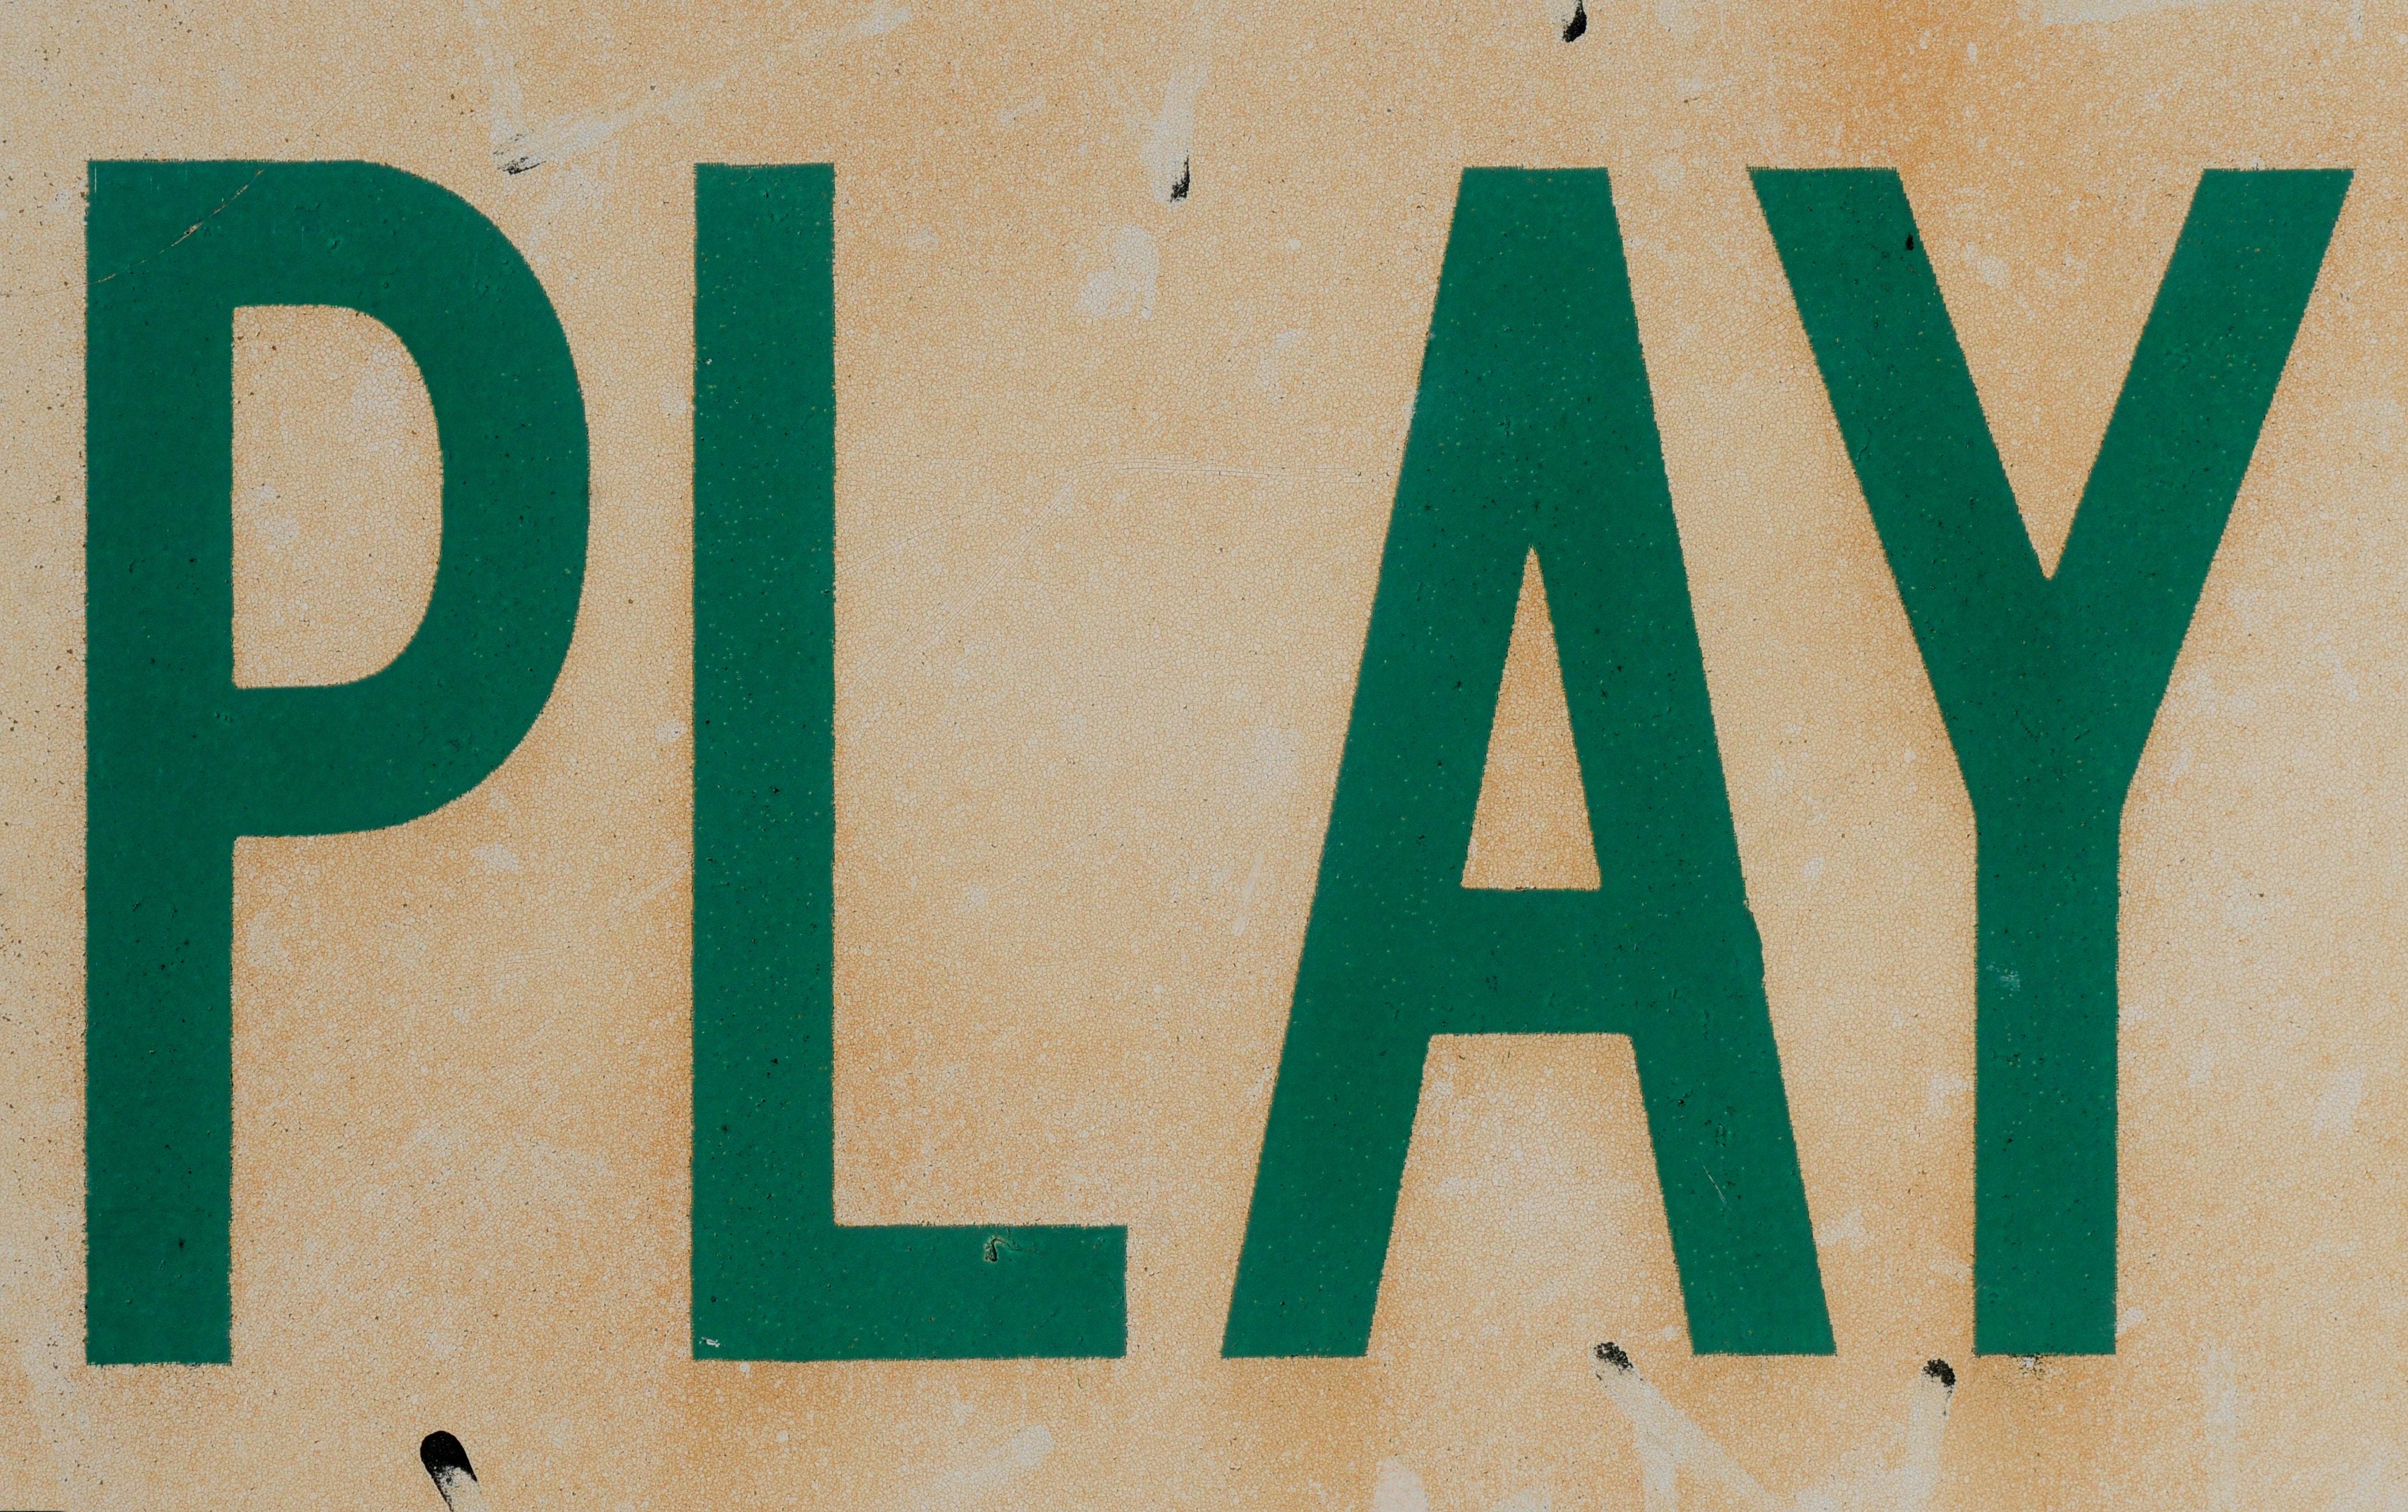 Headerbild Play Tennis